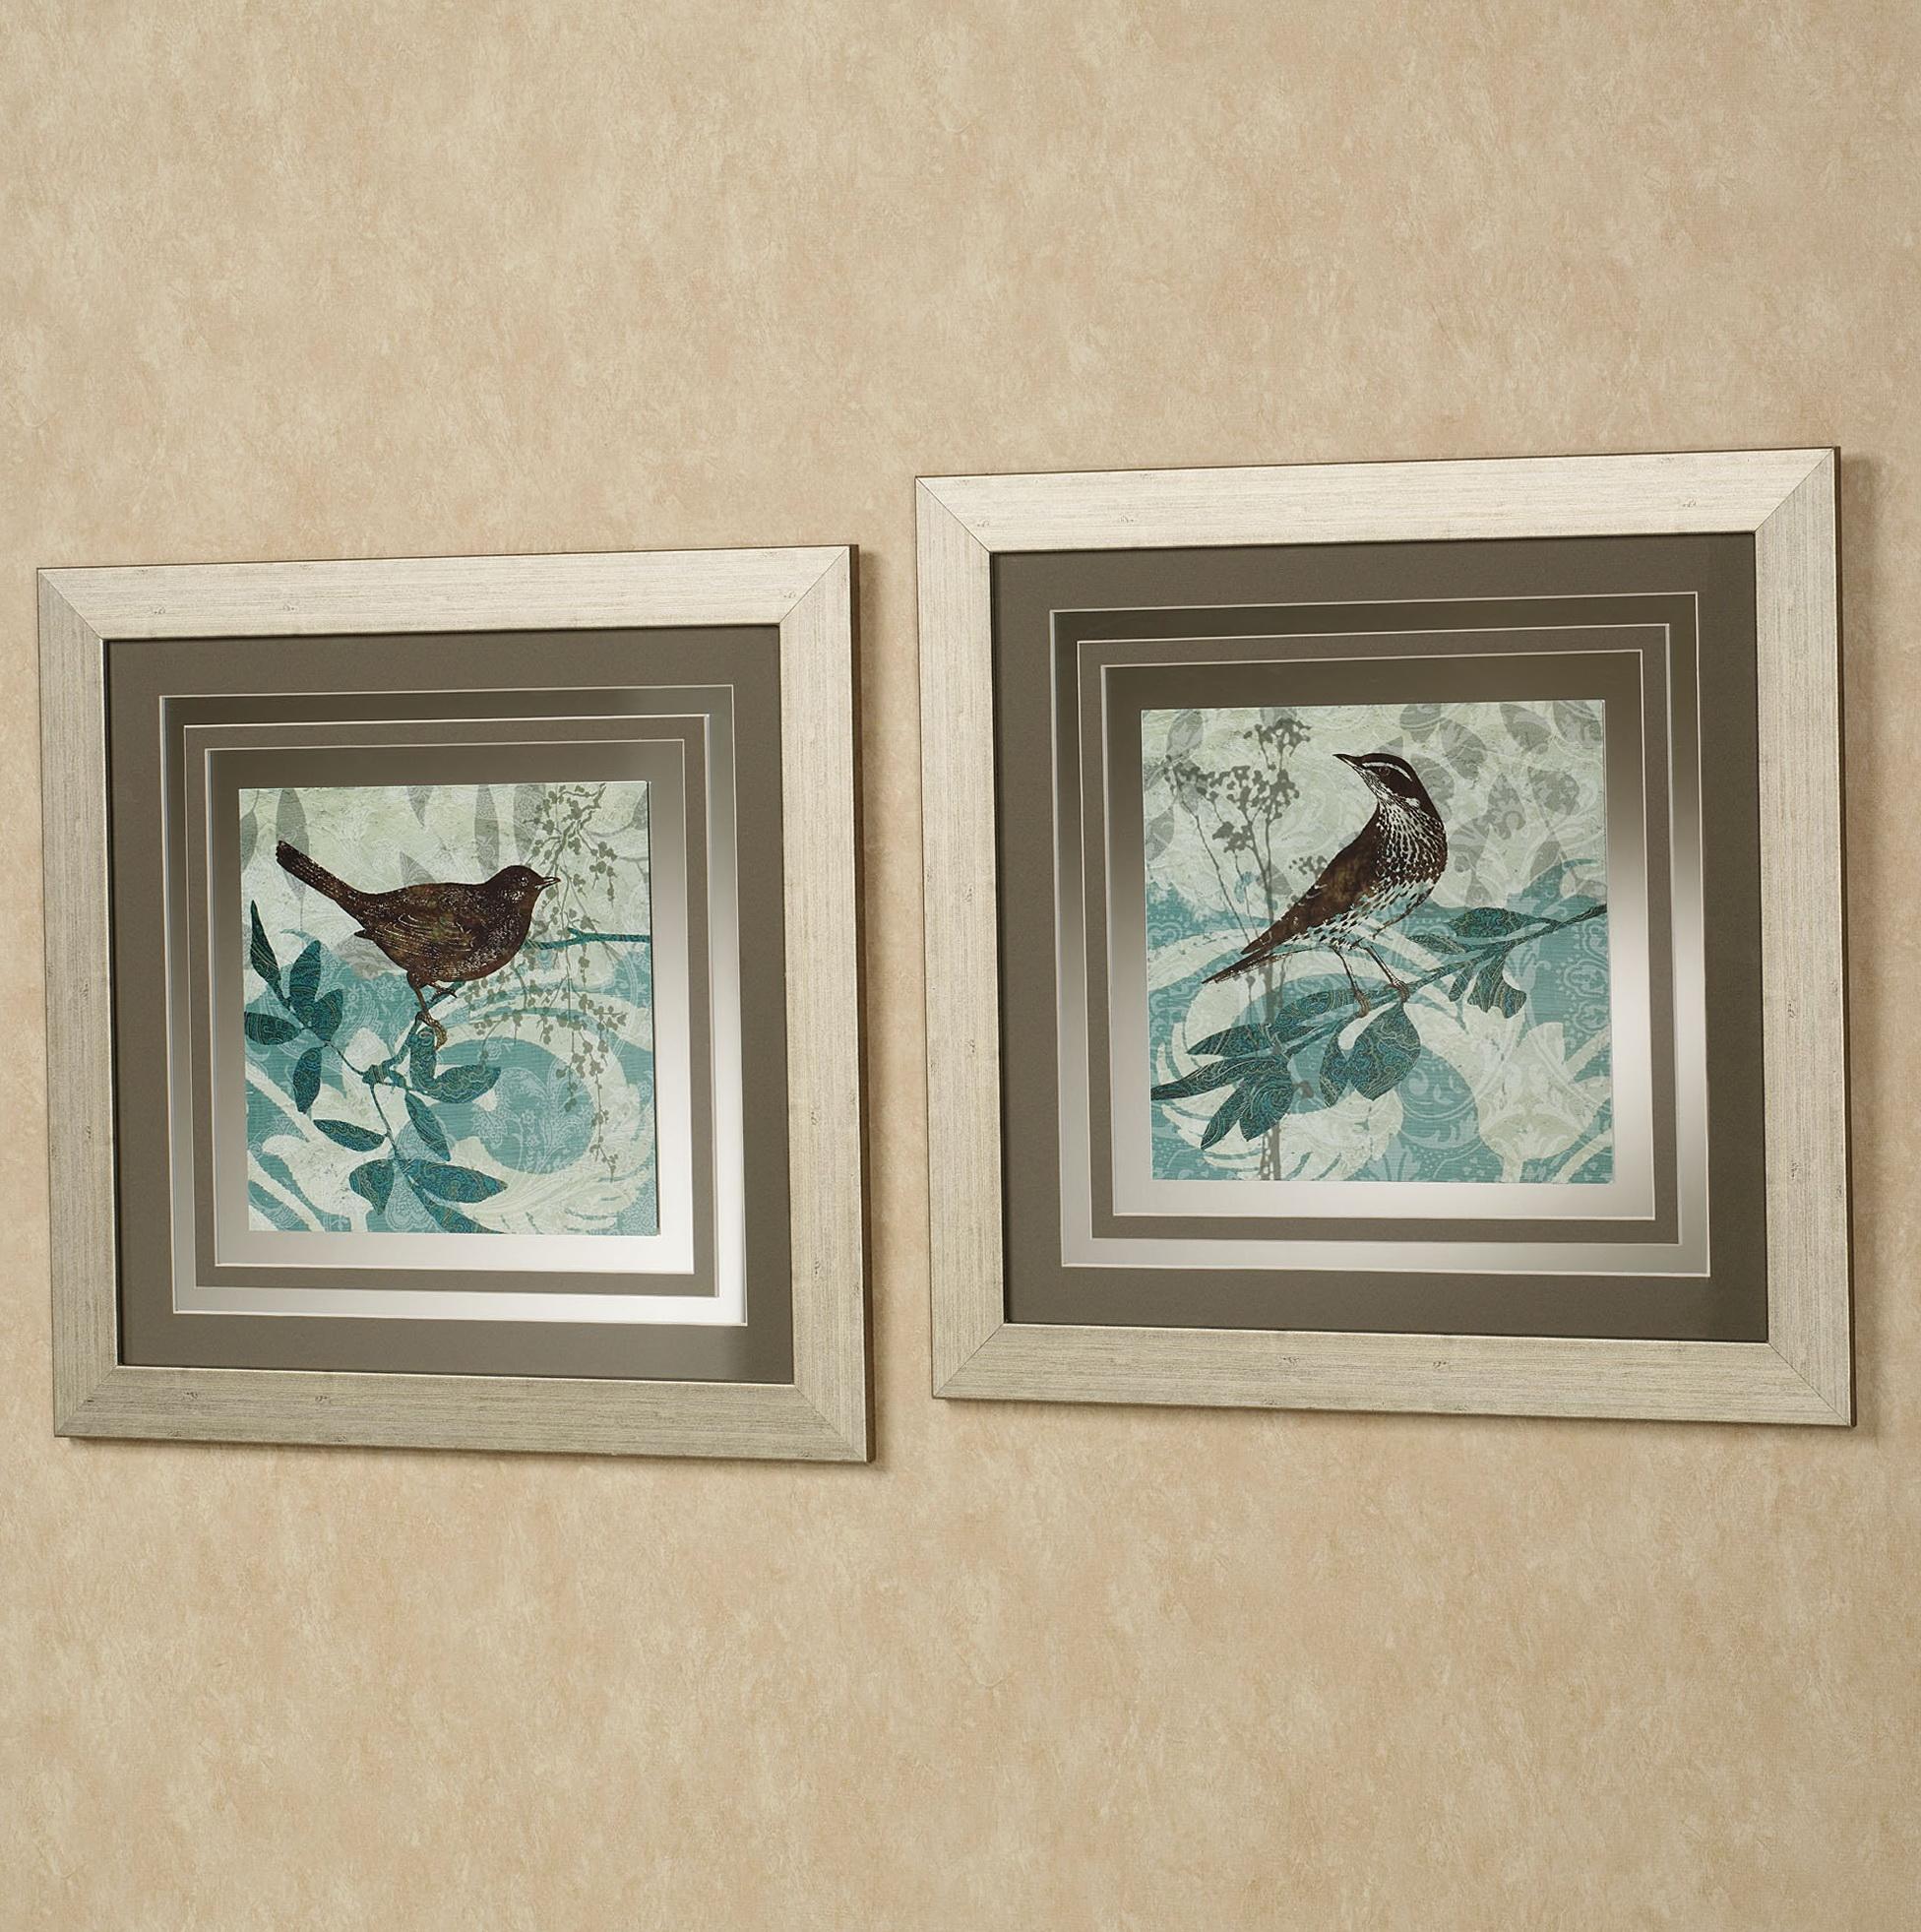 Mirrored Framed Wall Art